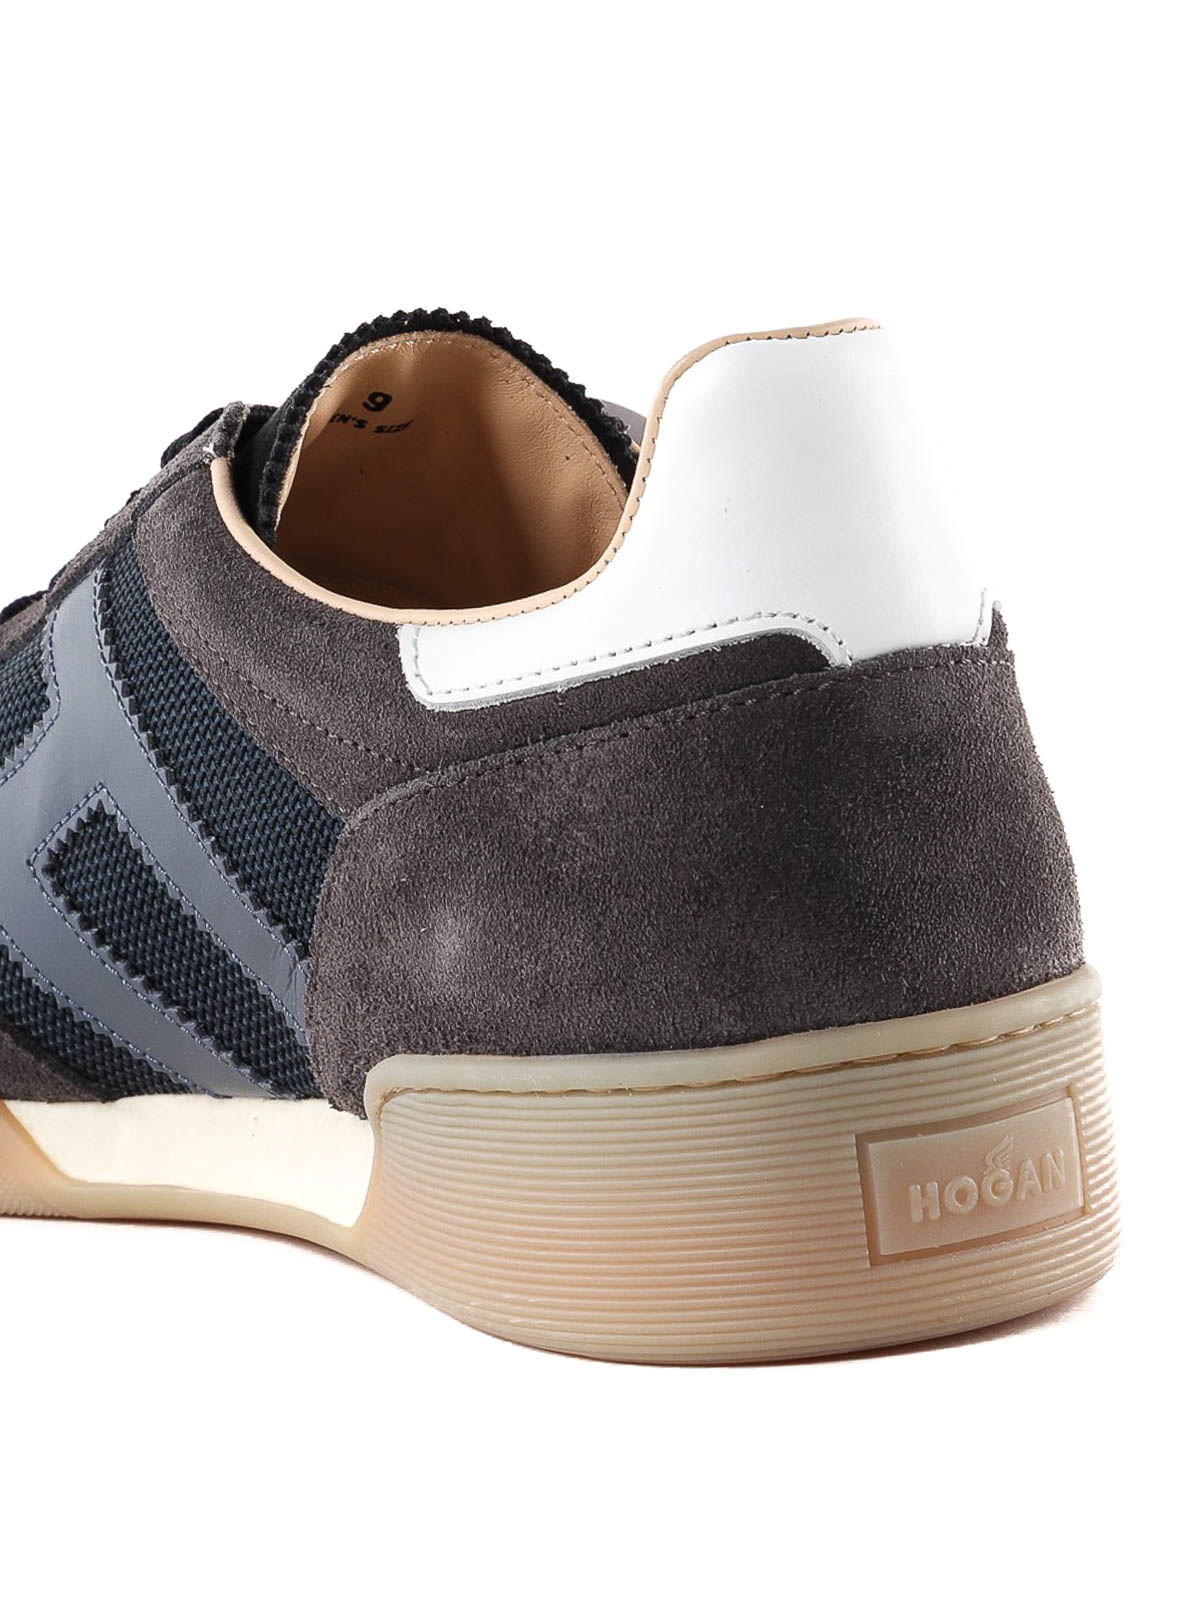 Hogan - Sneaker H357 marrone e blu in camoscio - sneakers ...